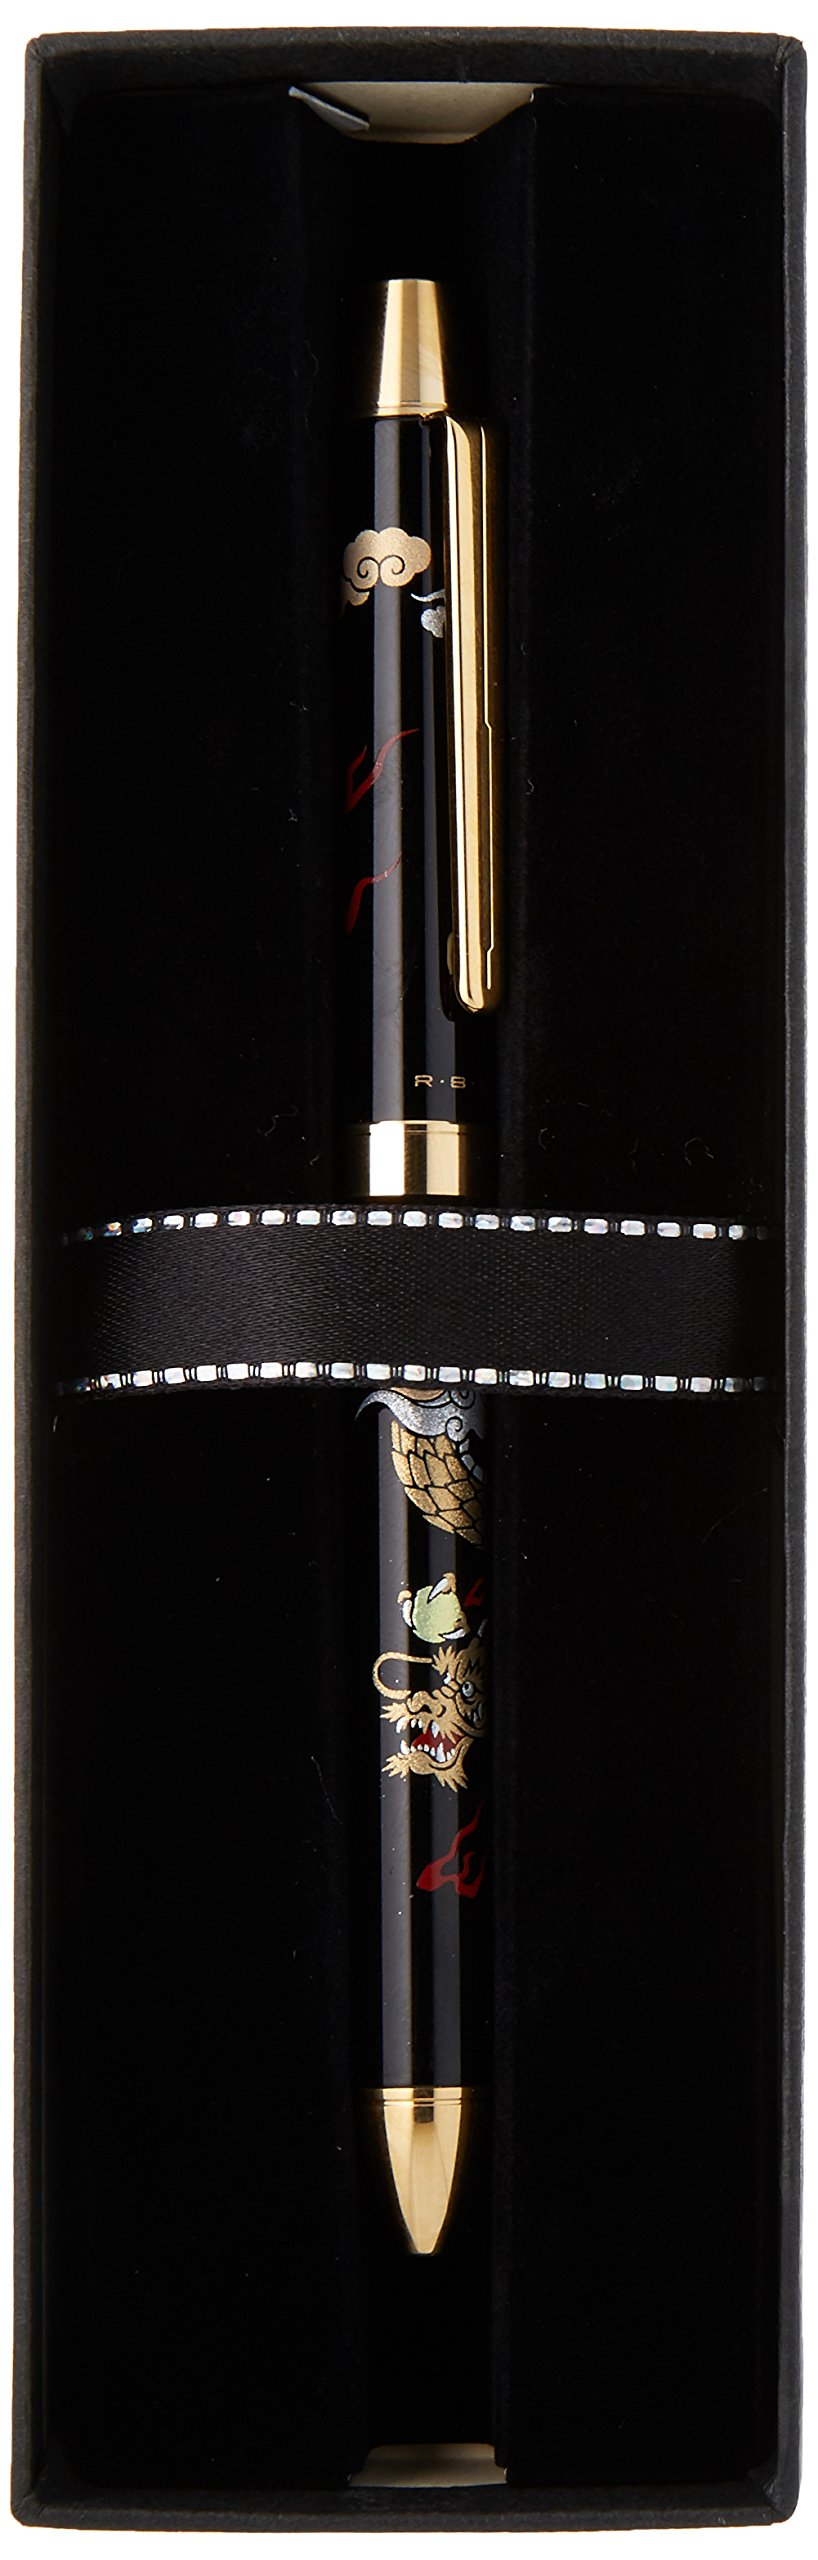 Pilot Mechanical Pencil, 0.5mm + Ballpoint Pen, 0.7mm, Fine, Black and Red, 2+1 Miyabi Emaki, Dragon (BTHM-5SR-R) by Pilot (Image #6)